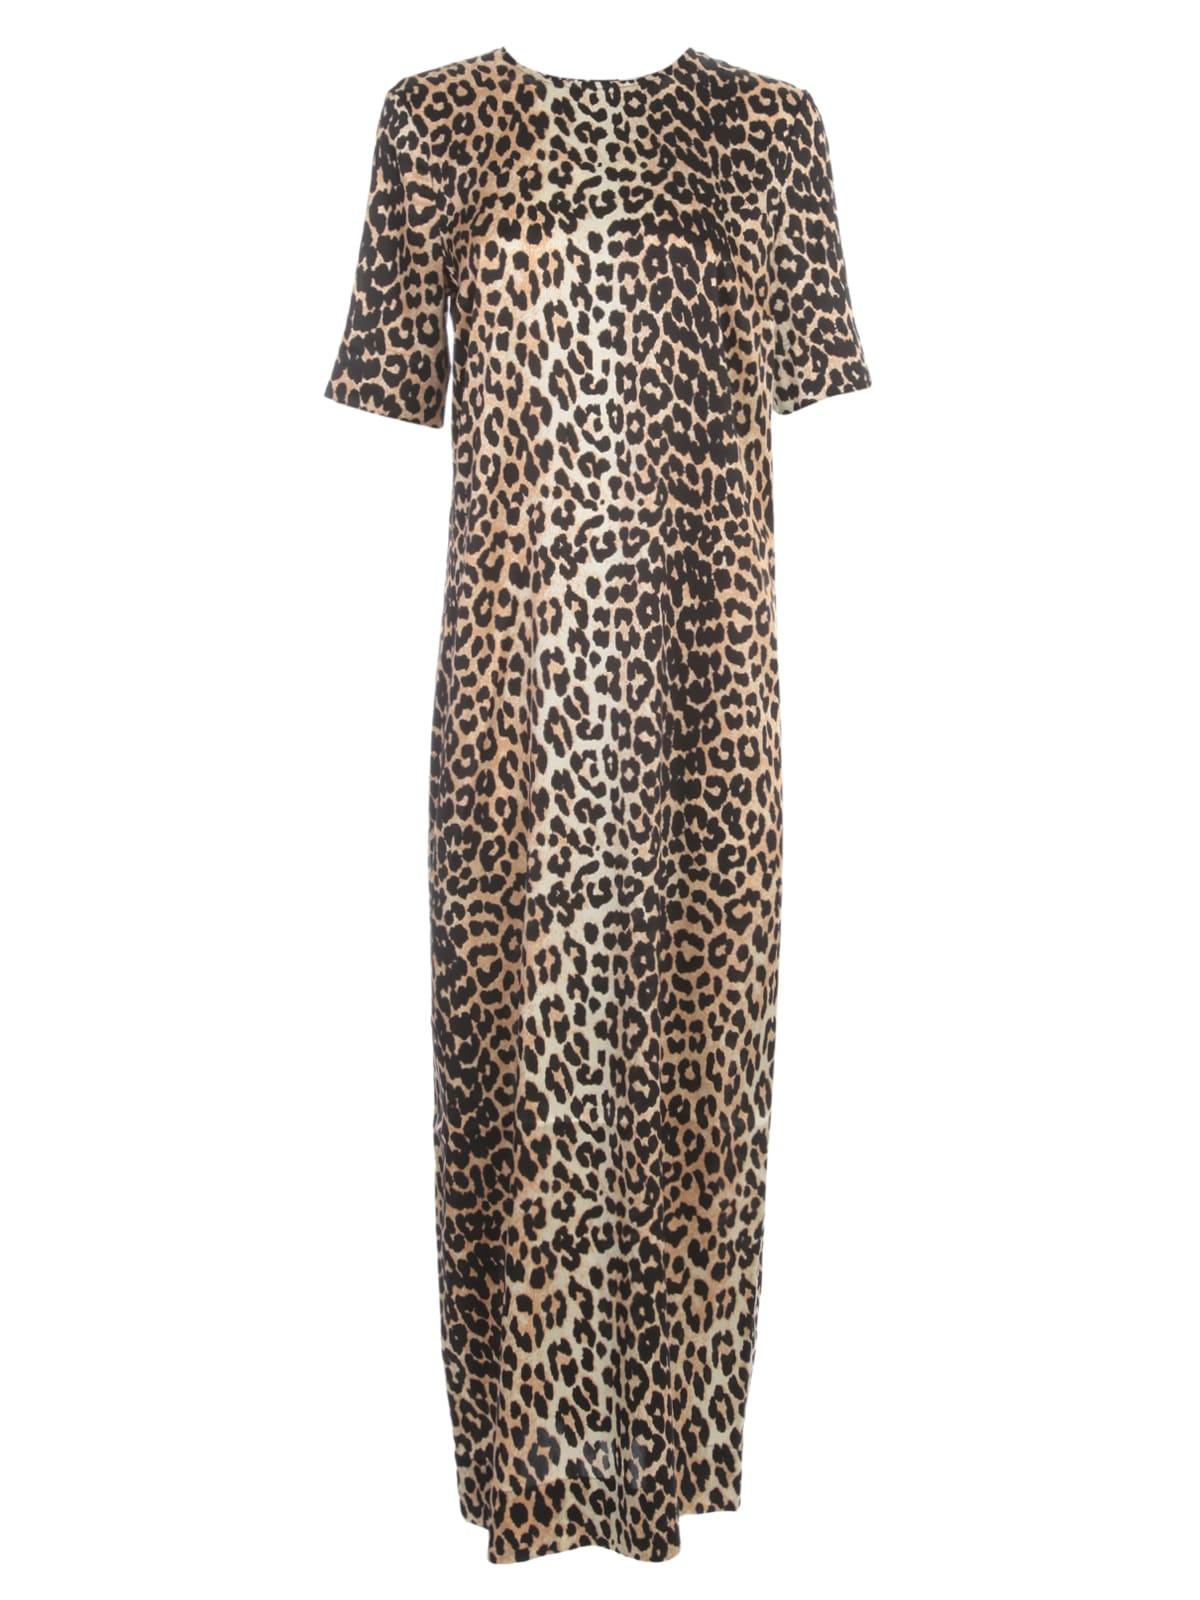 Buy Ganni Silk Stretch Satin Maxi Dress 3/4s Crew Neck Animalier online, shop Ganni with free shipping